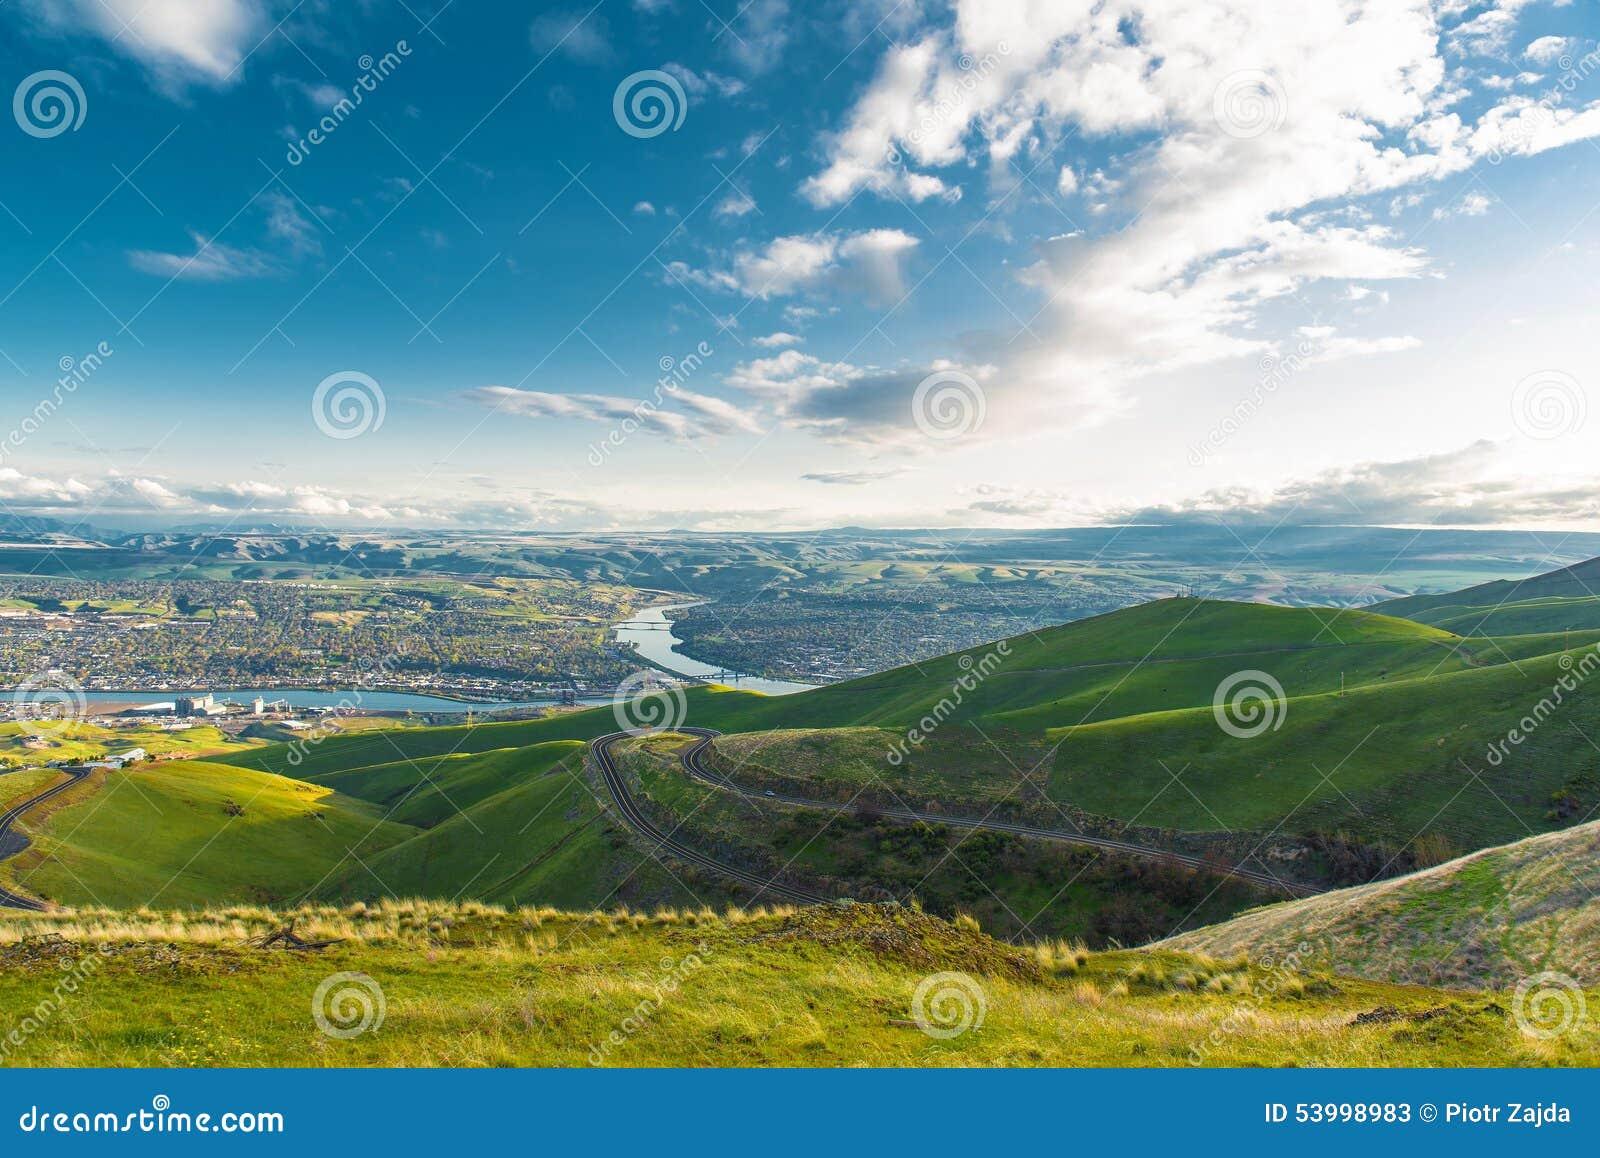 Lewiston (ID) United States  City new picture : Clarkston Washington and Lewiston Idaho Border Cities. United States.